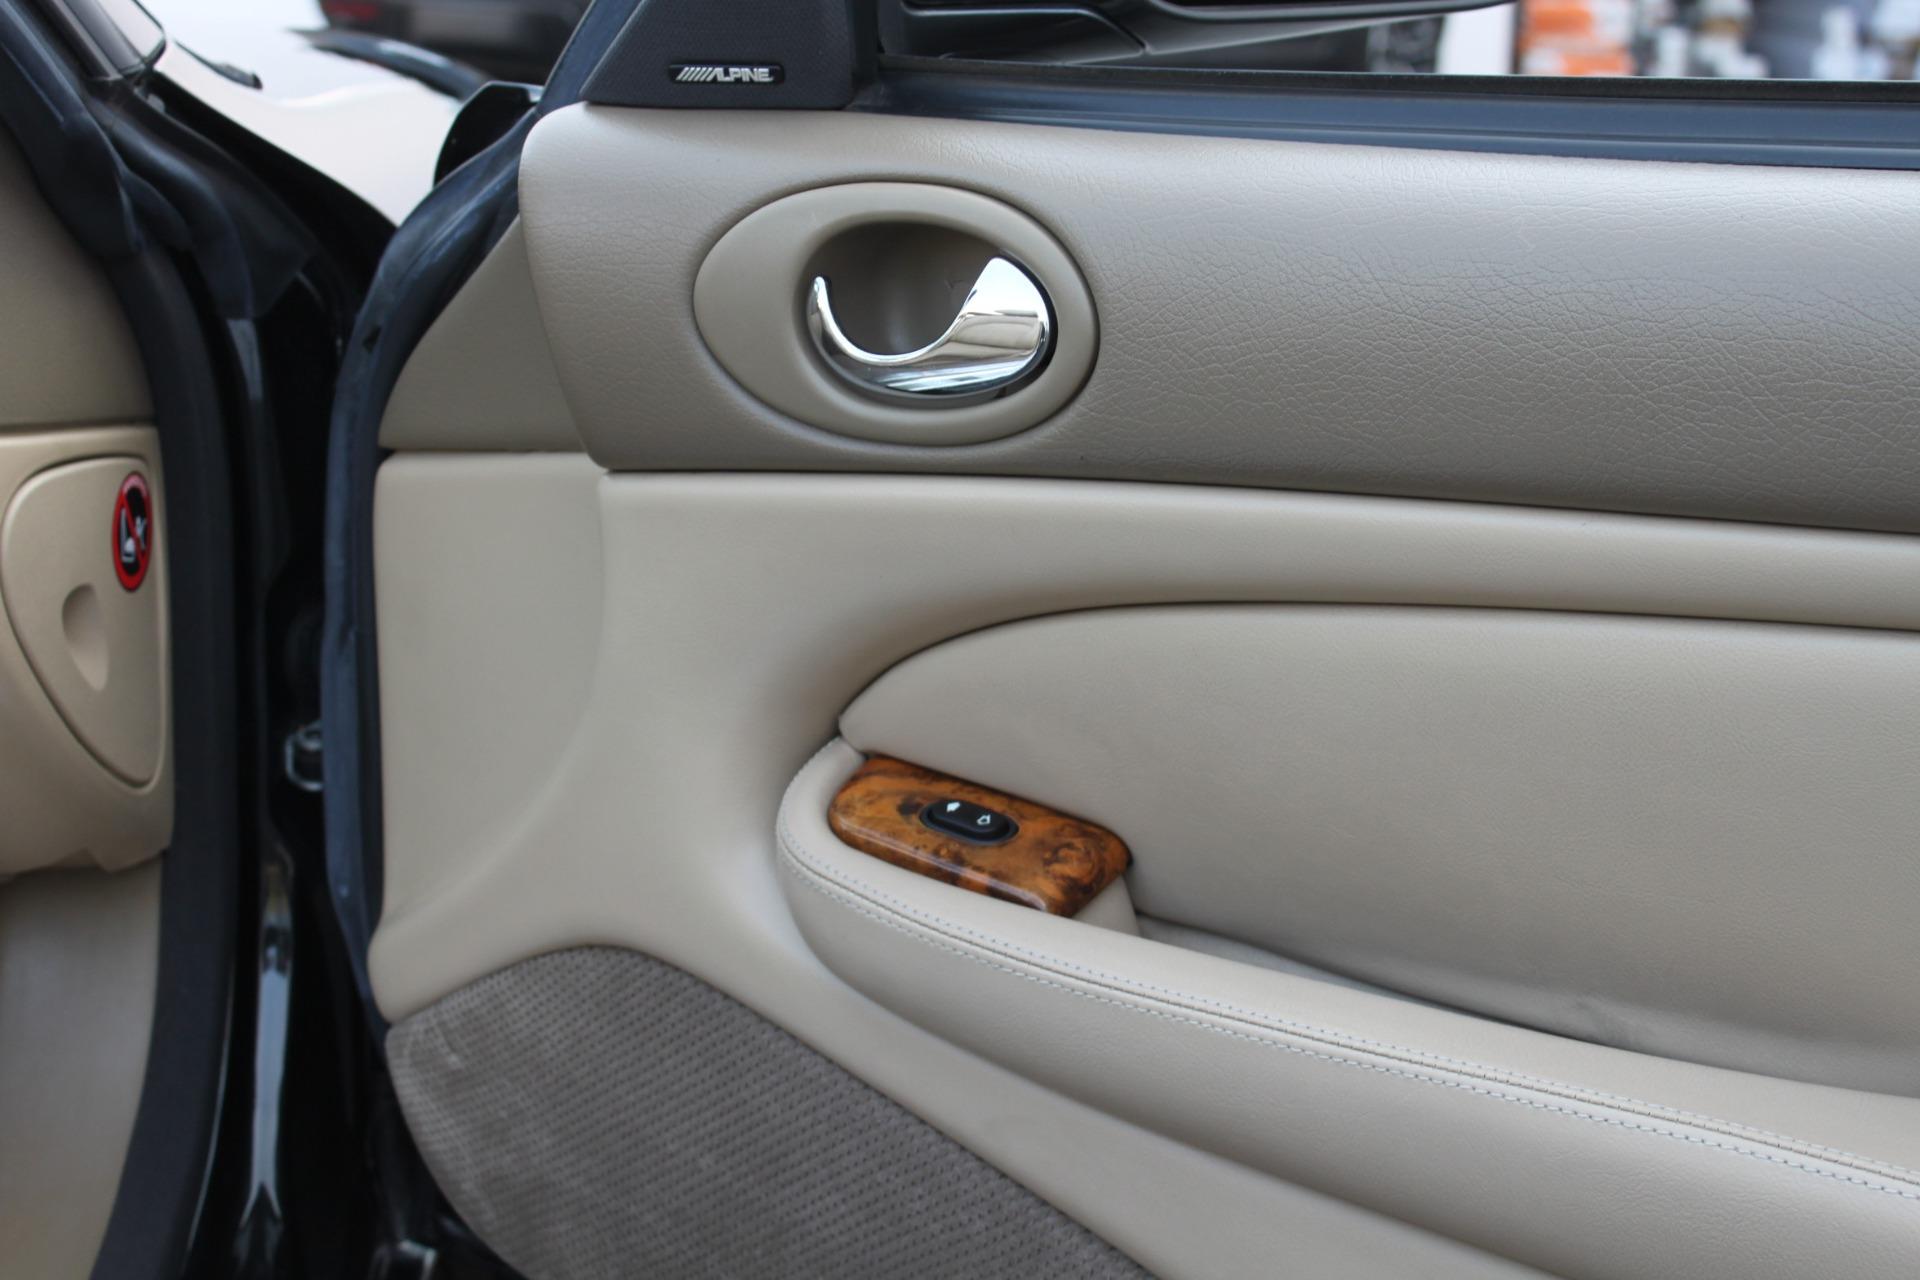 Used-2002-Jaguar-XK8-Convertible-XK8-Collector